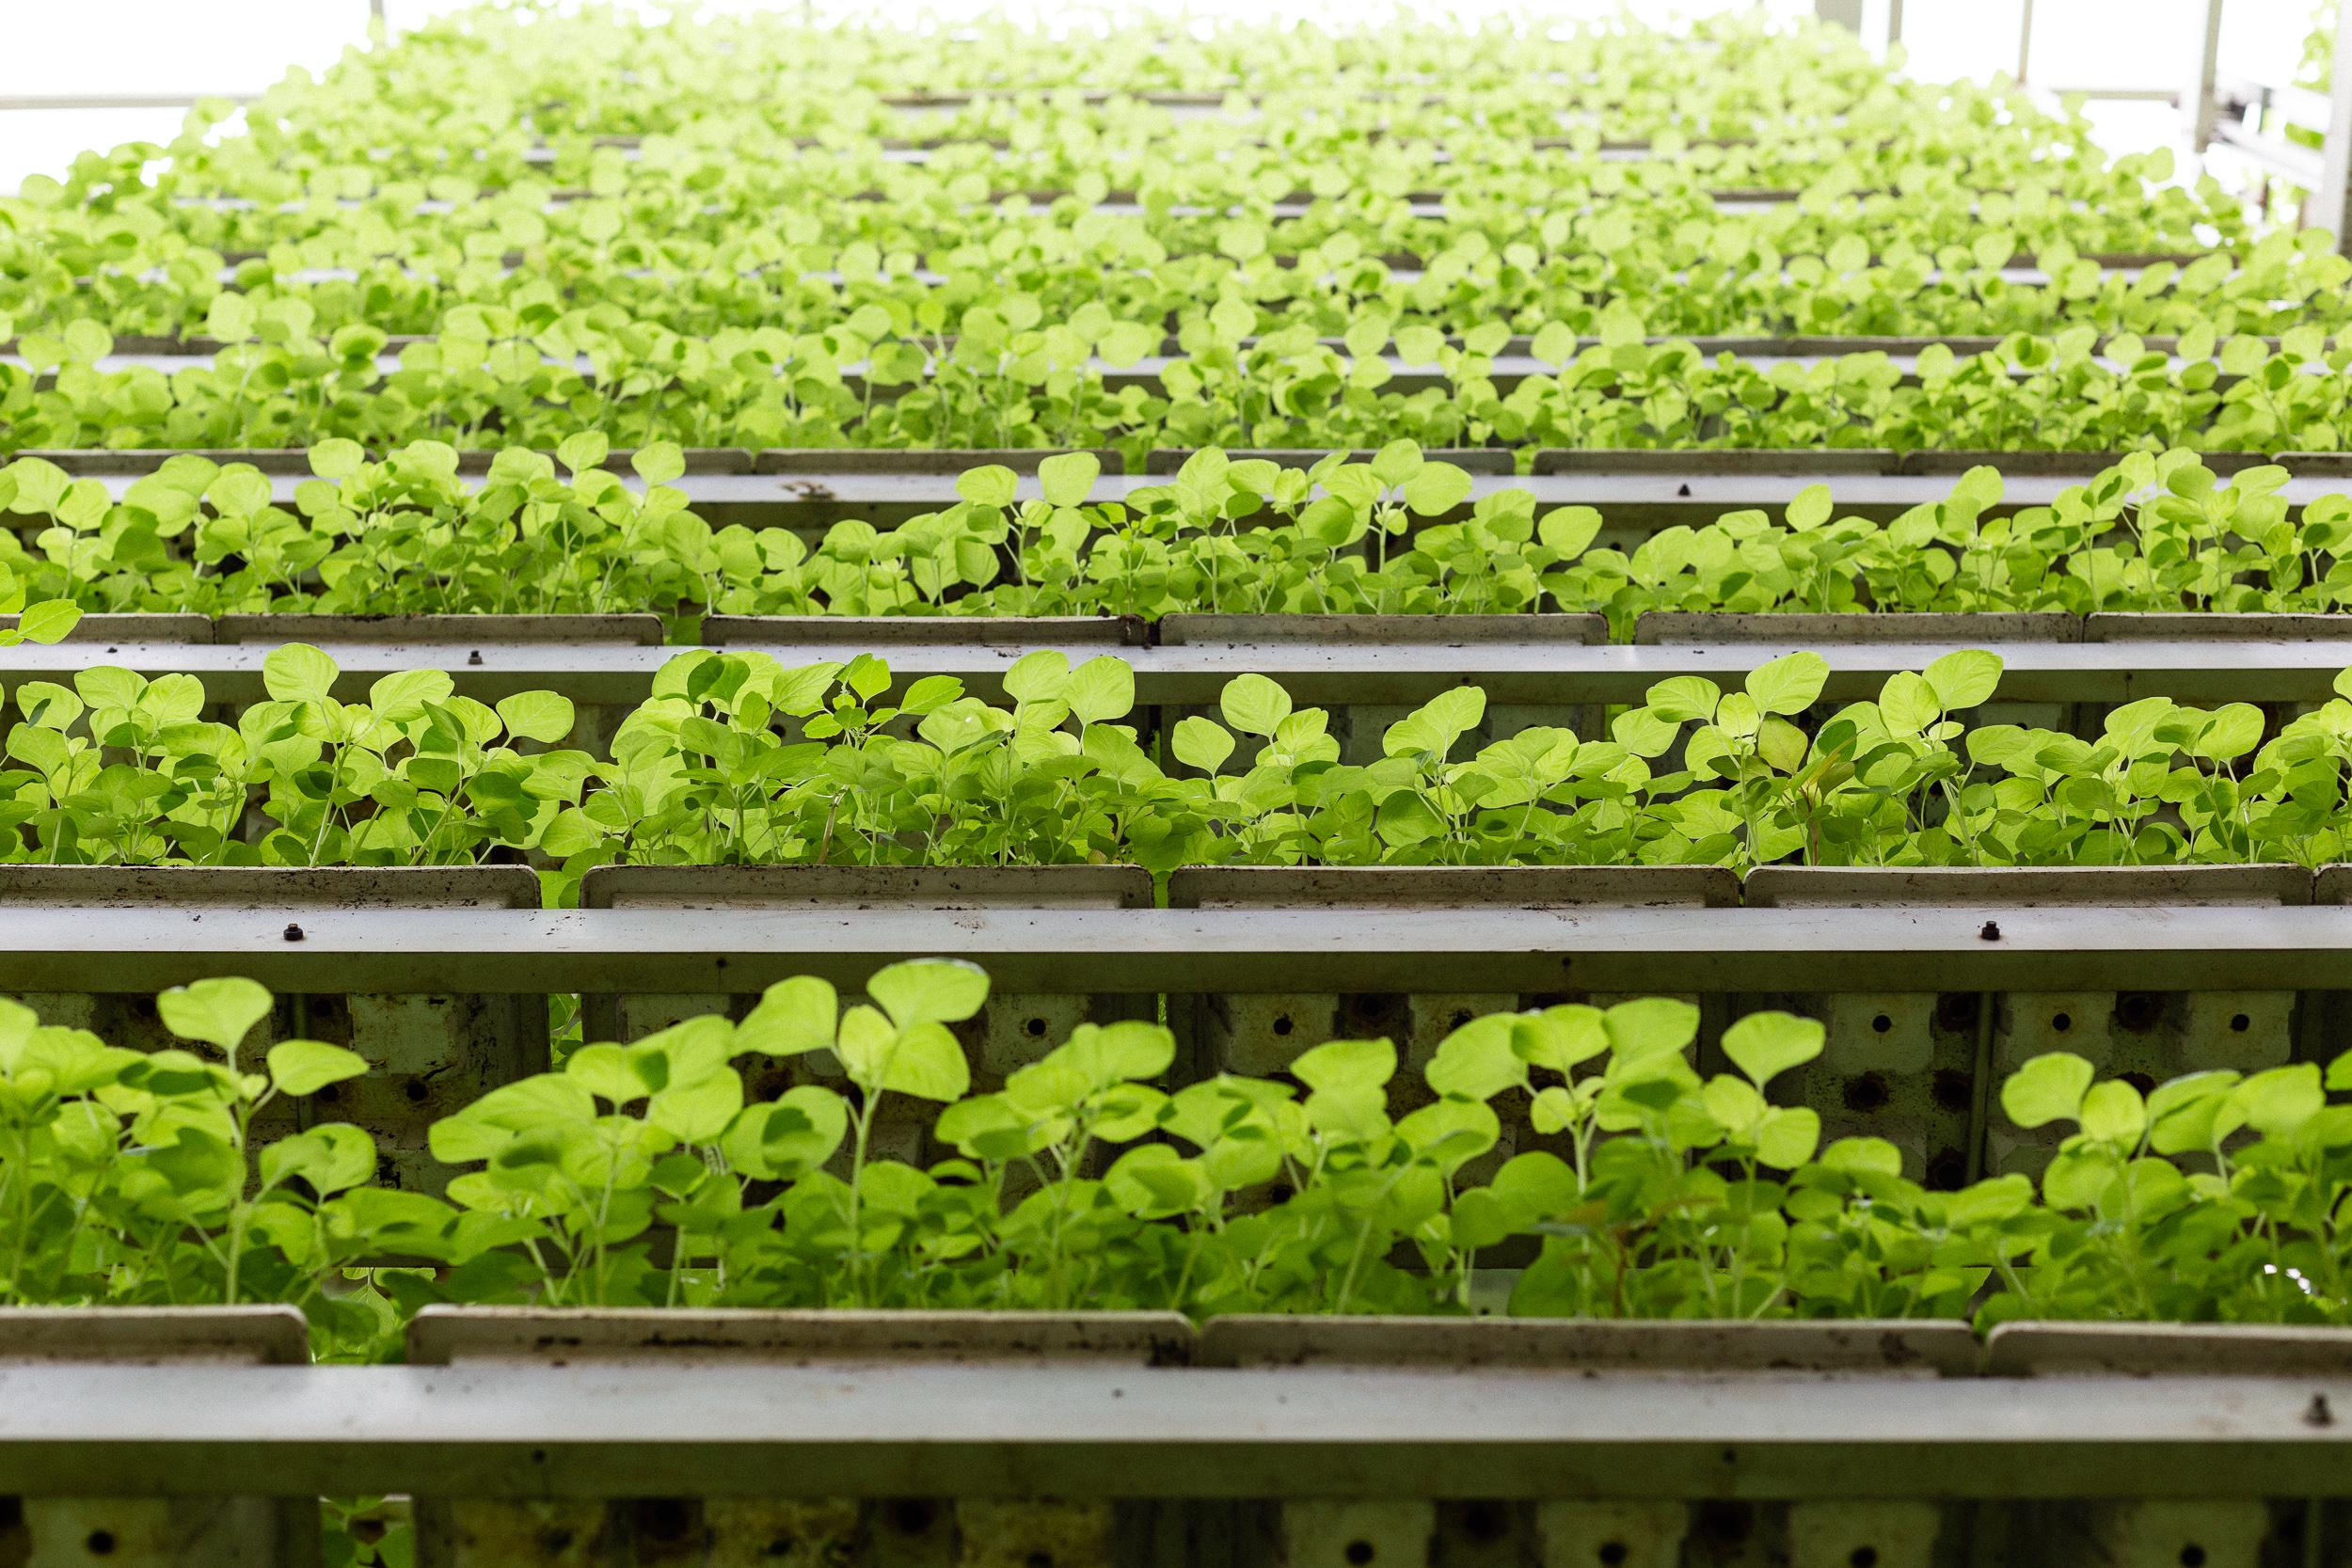 singapore-commercial-editorial-photographer-zainal-zainal-vertical-farming-skygreens-pictet-07.jpg